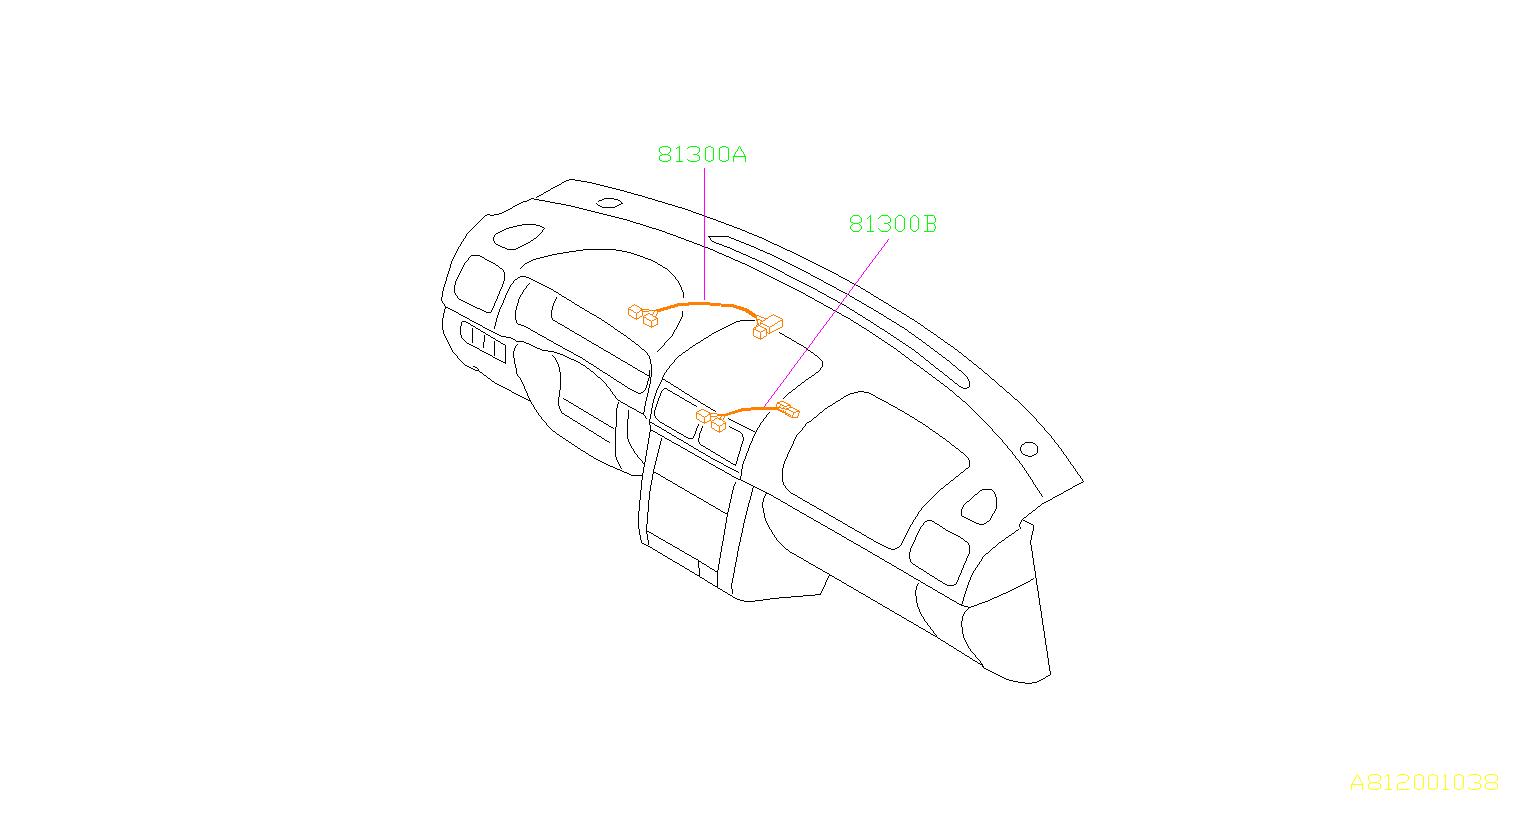 Subaru Impreza Harness Instrument Panel Combi Meter